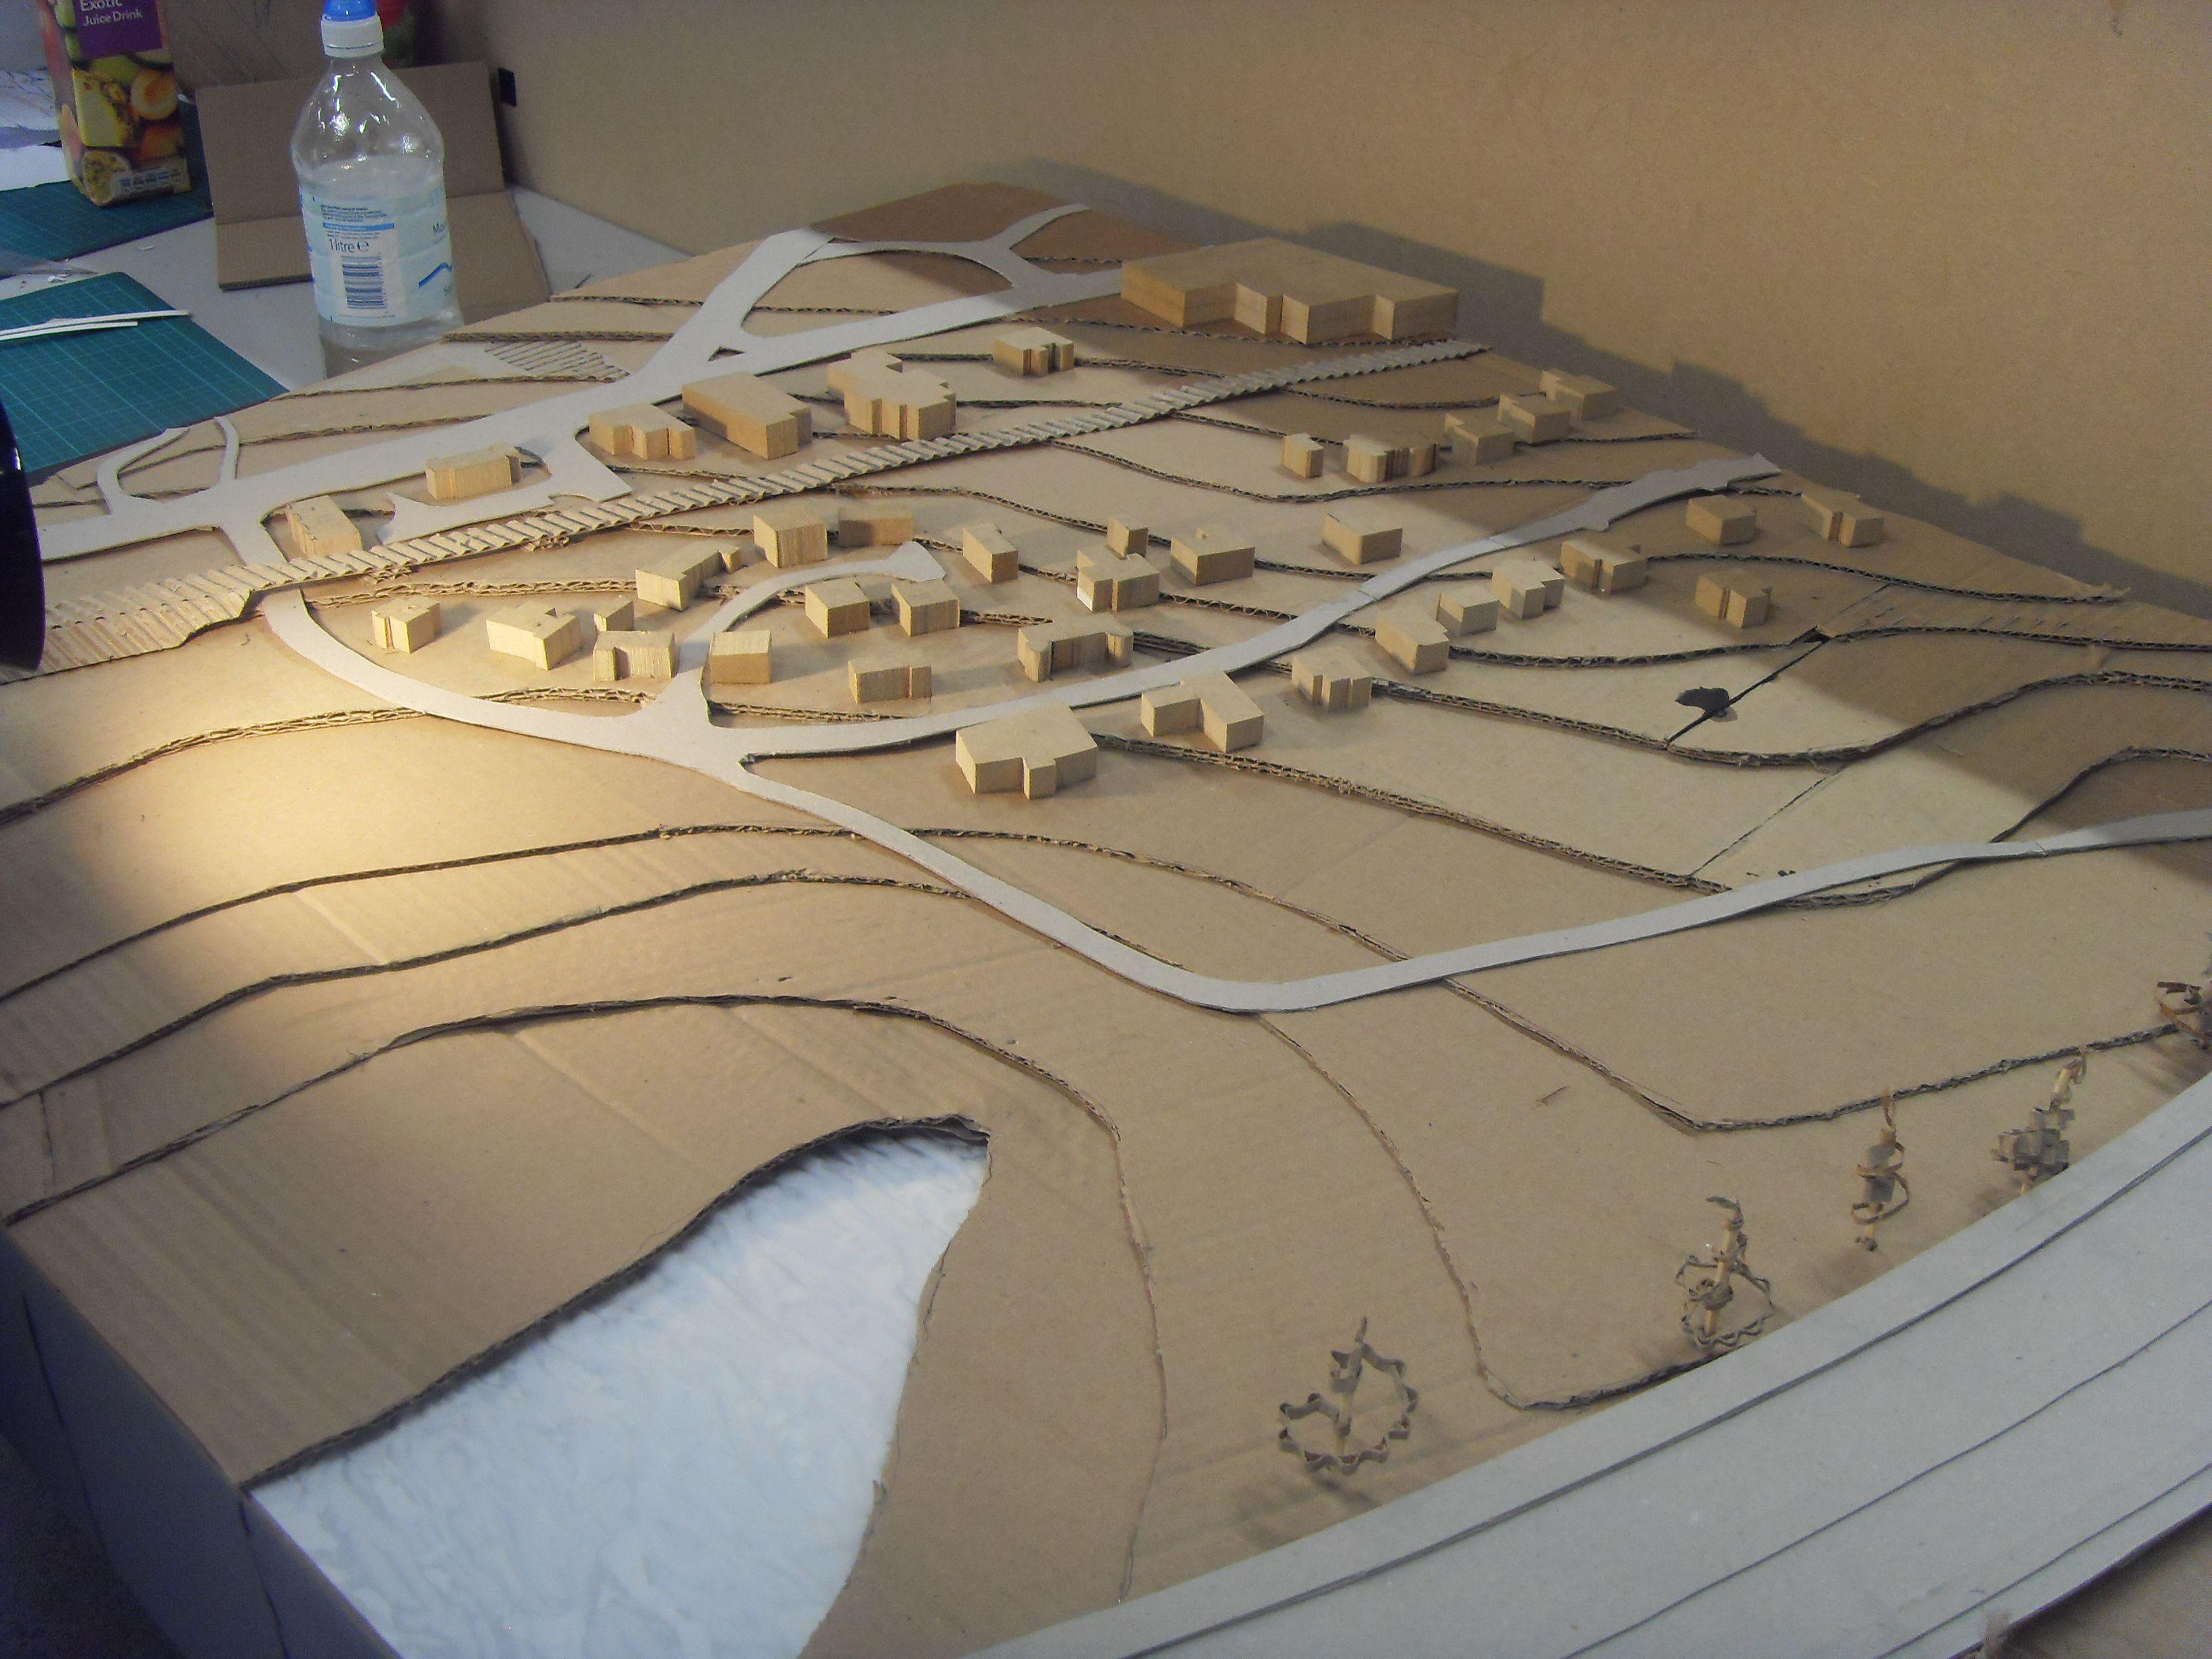 architectural site model materials scale 1 500 landscape model